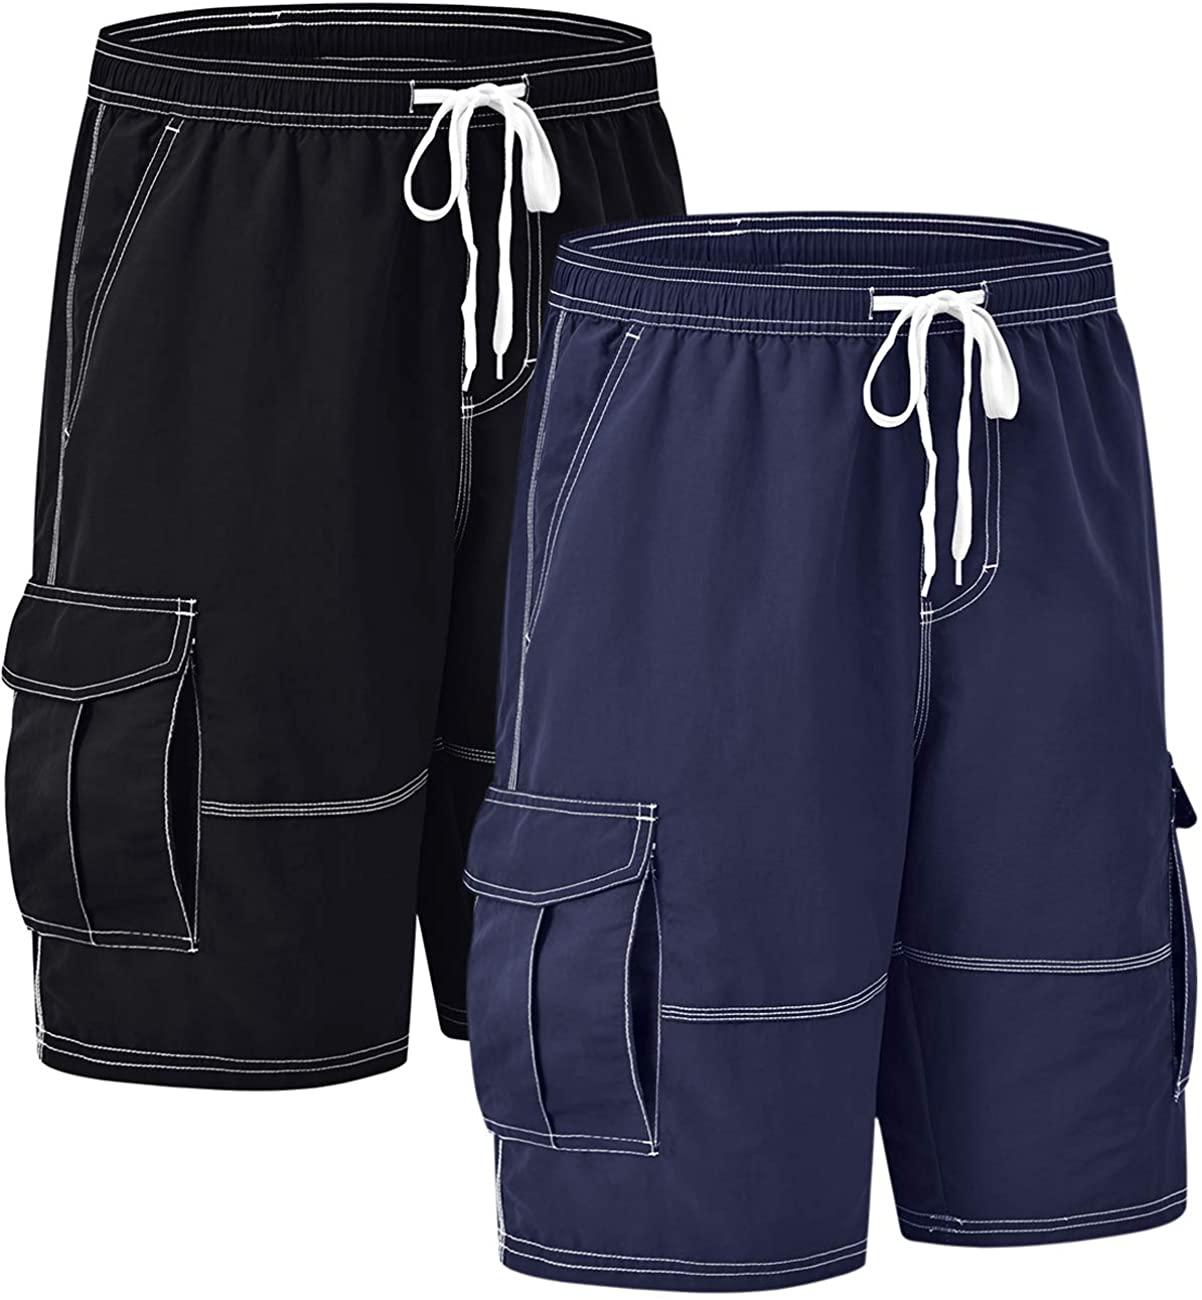 Akula Men's Swim Trunks Long Beach Shorts Quick Dry Board Shorts with Cargo Pockets